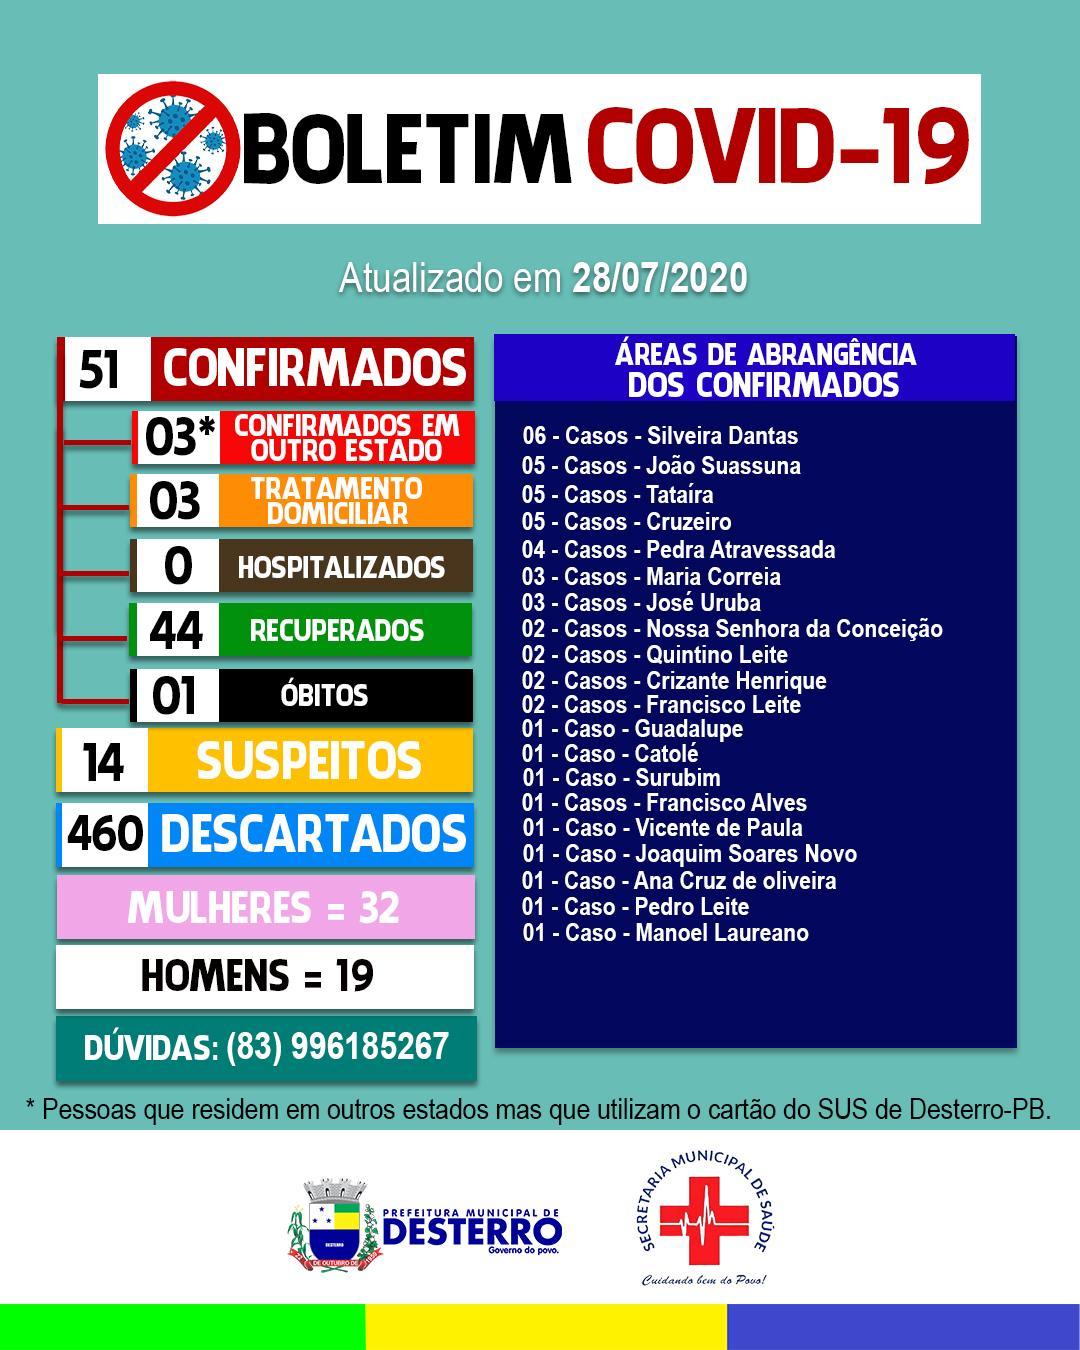 Boletim Covid-19 (28/07/2020)